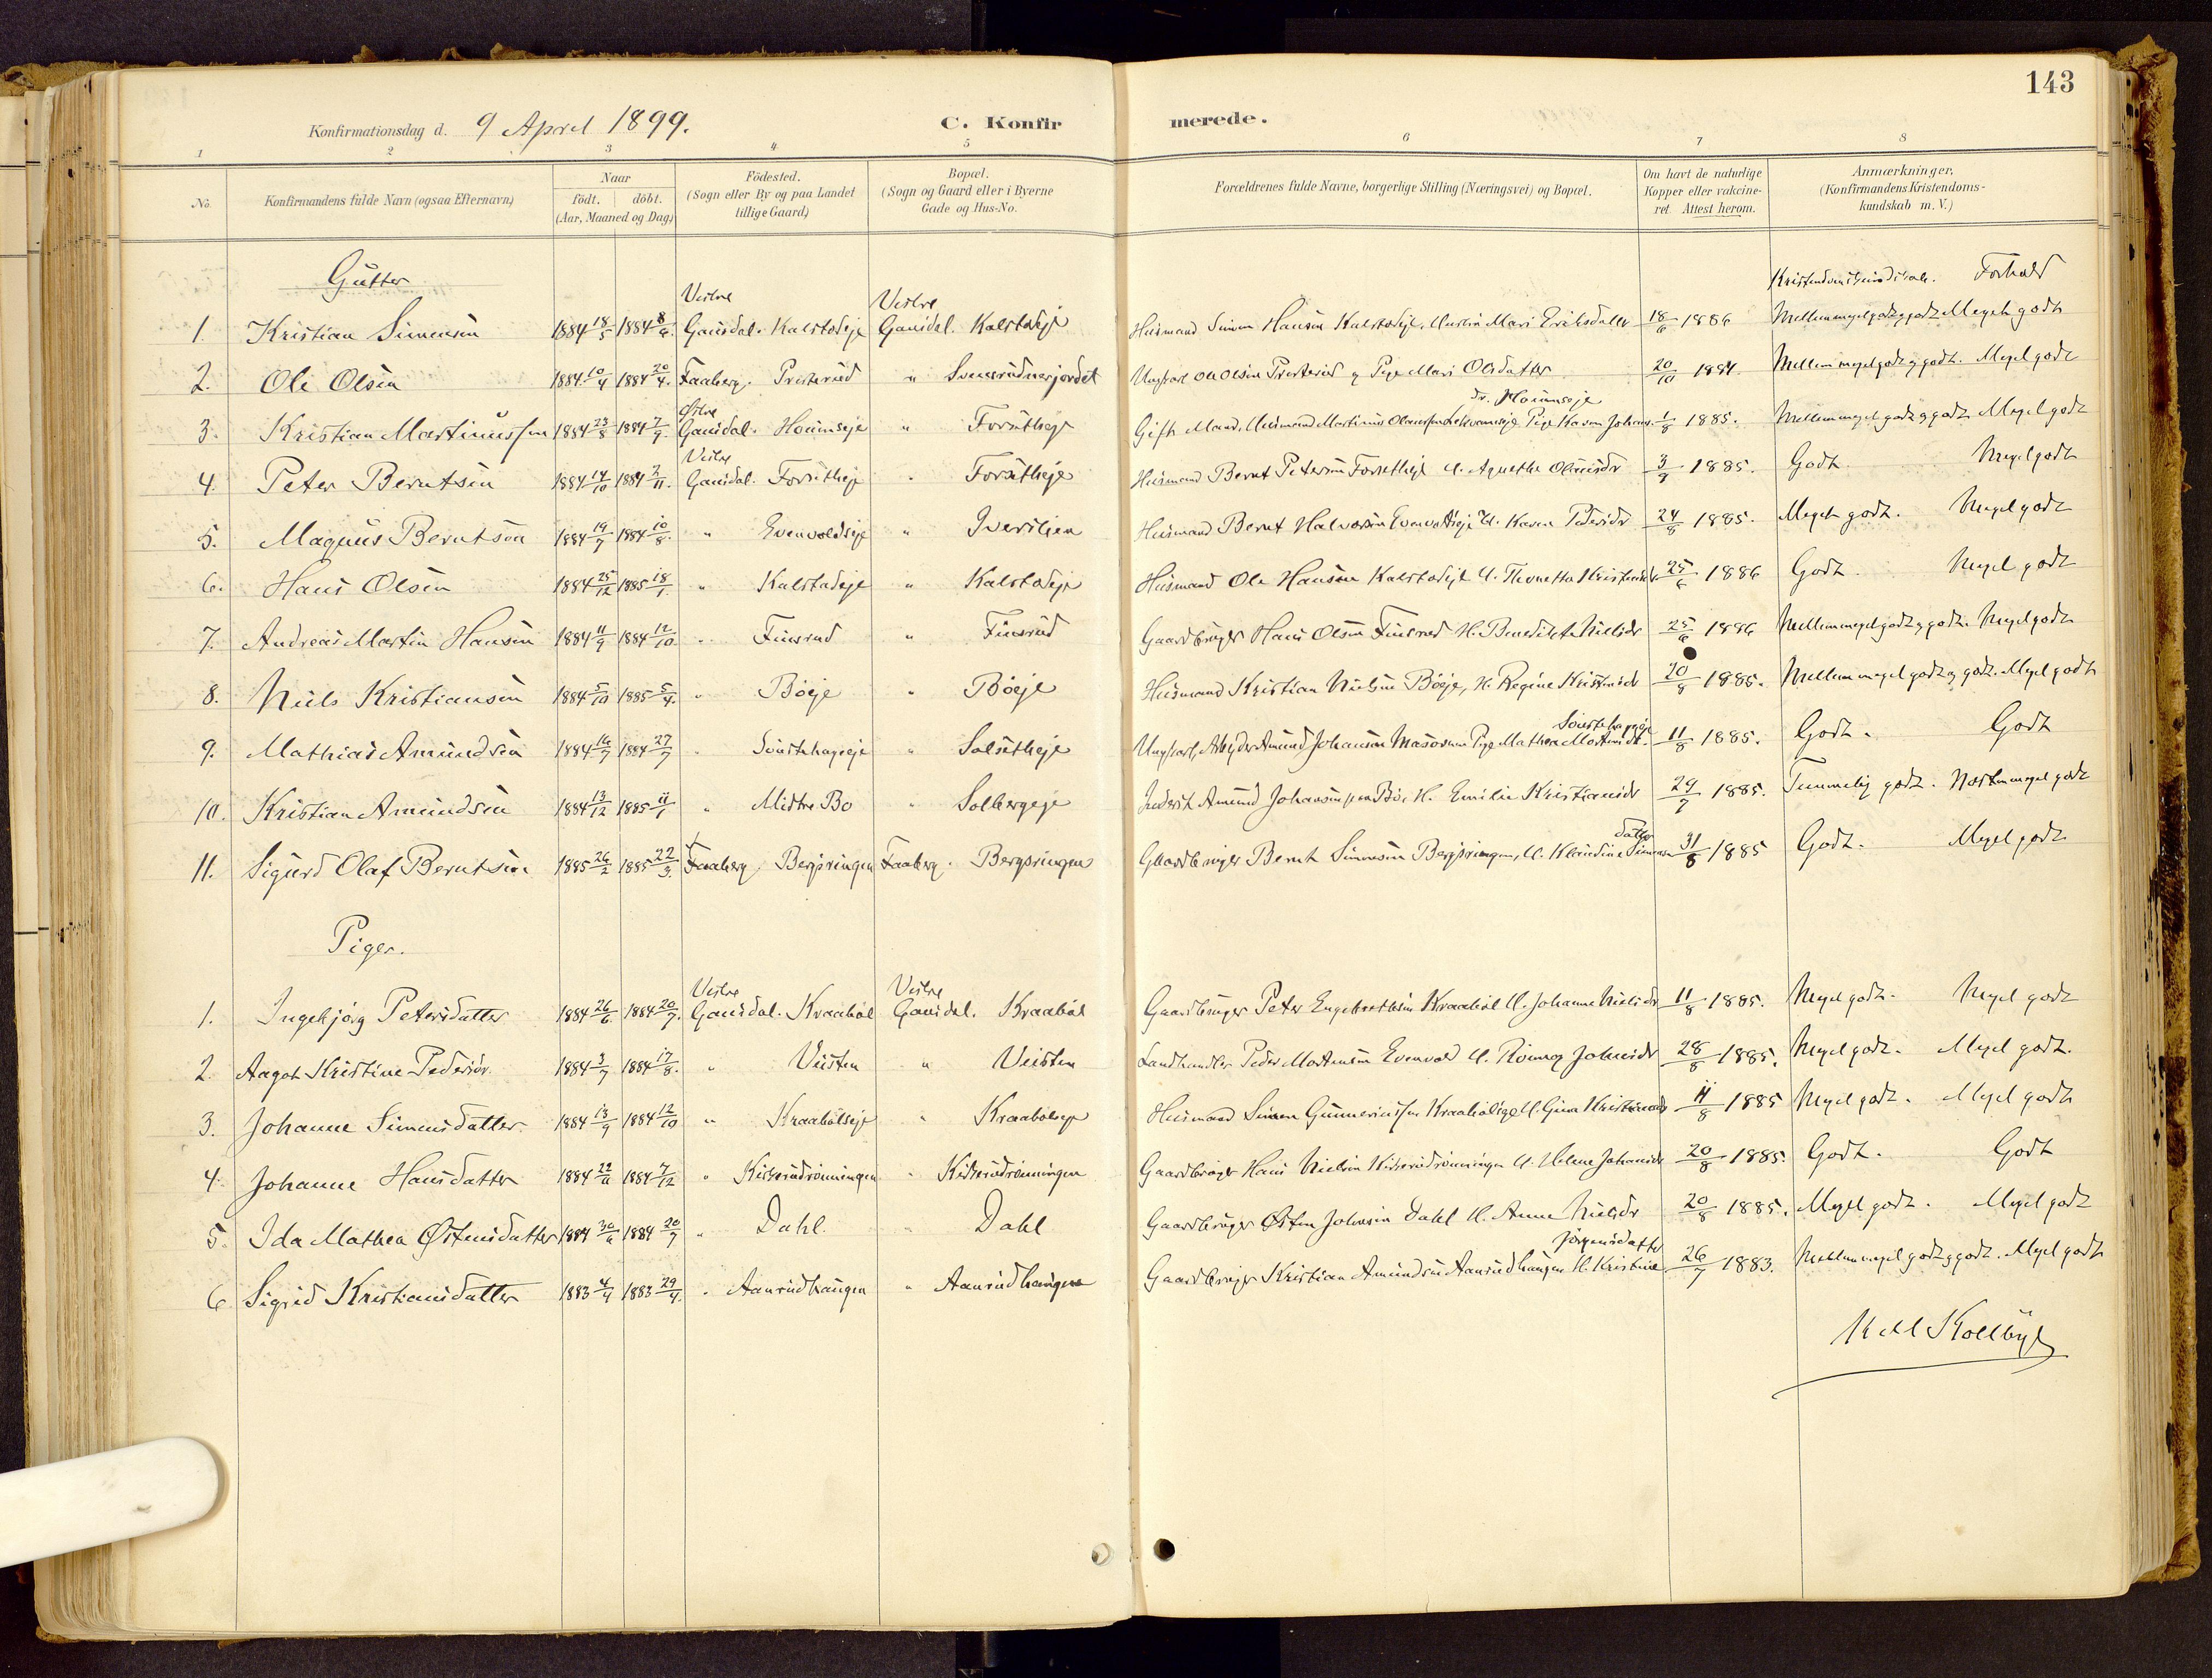 SAH, Vestre Gausdal prestekontor, Ministerialbok nr. 1, 1887-1914, s. 143